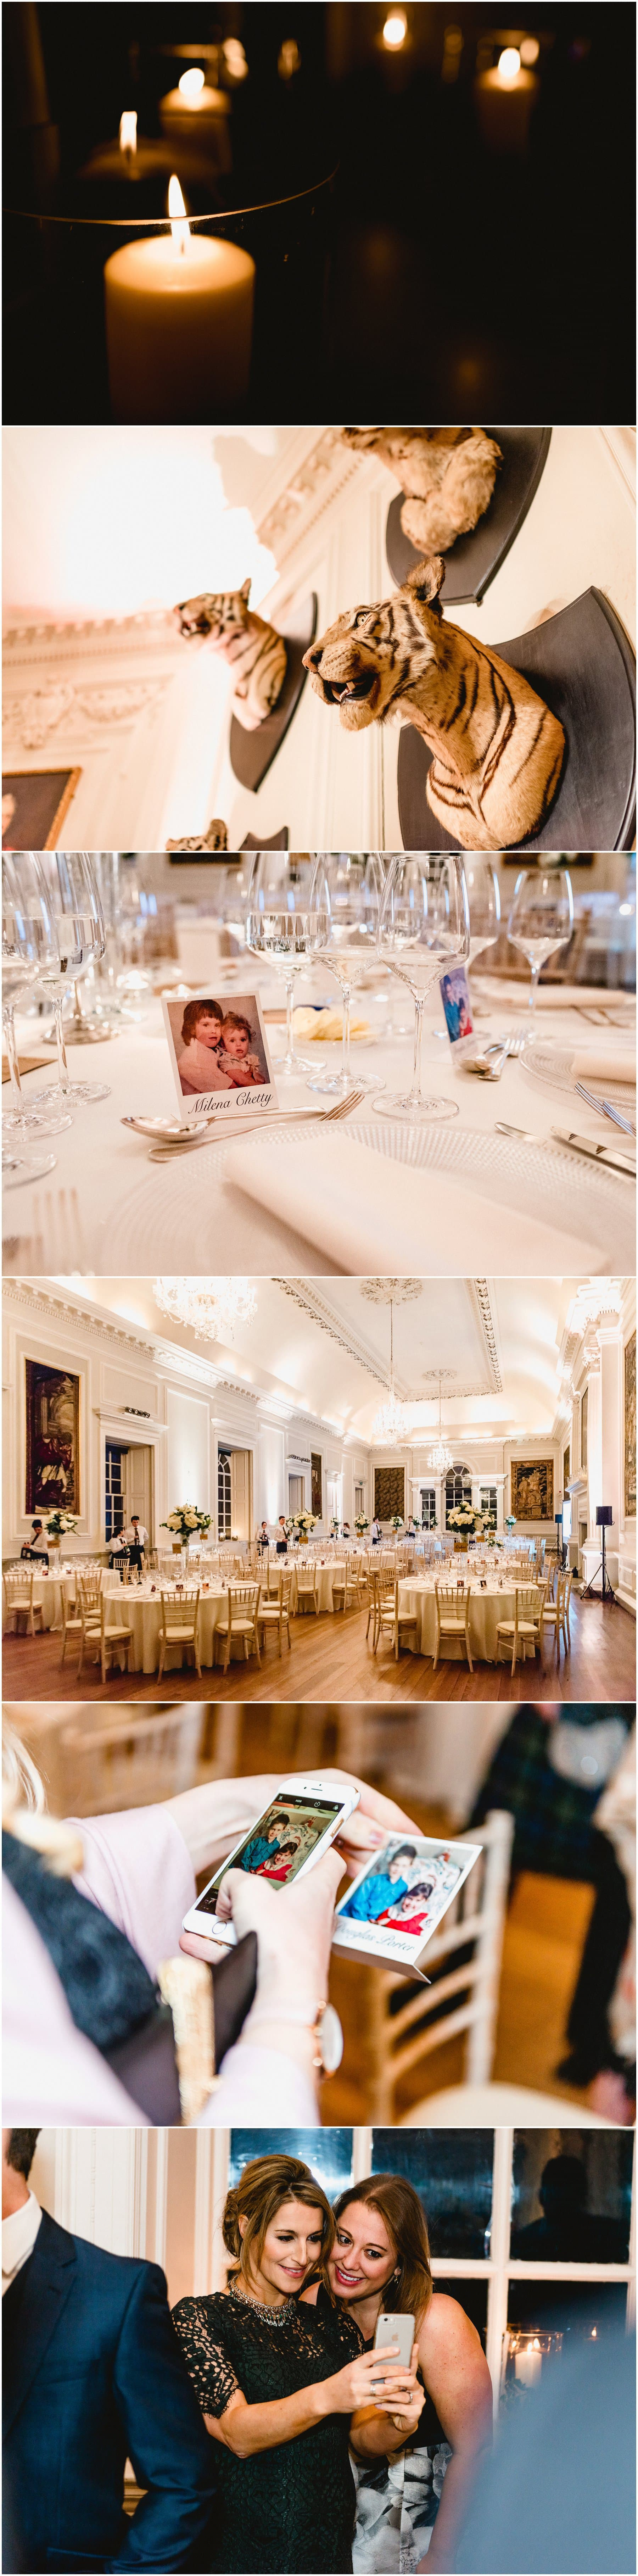 Hopetoun House wedding reception, wedding breakfast room details, simple, elegant design with Polaroid photos for table names.